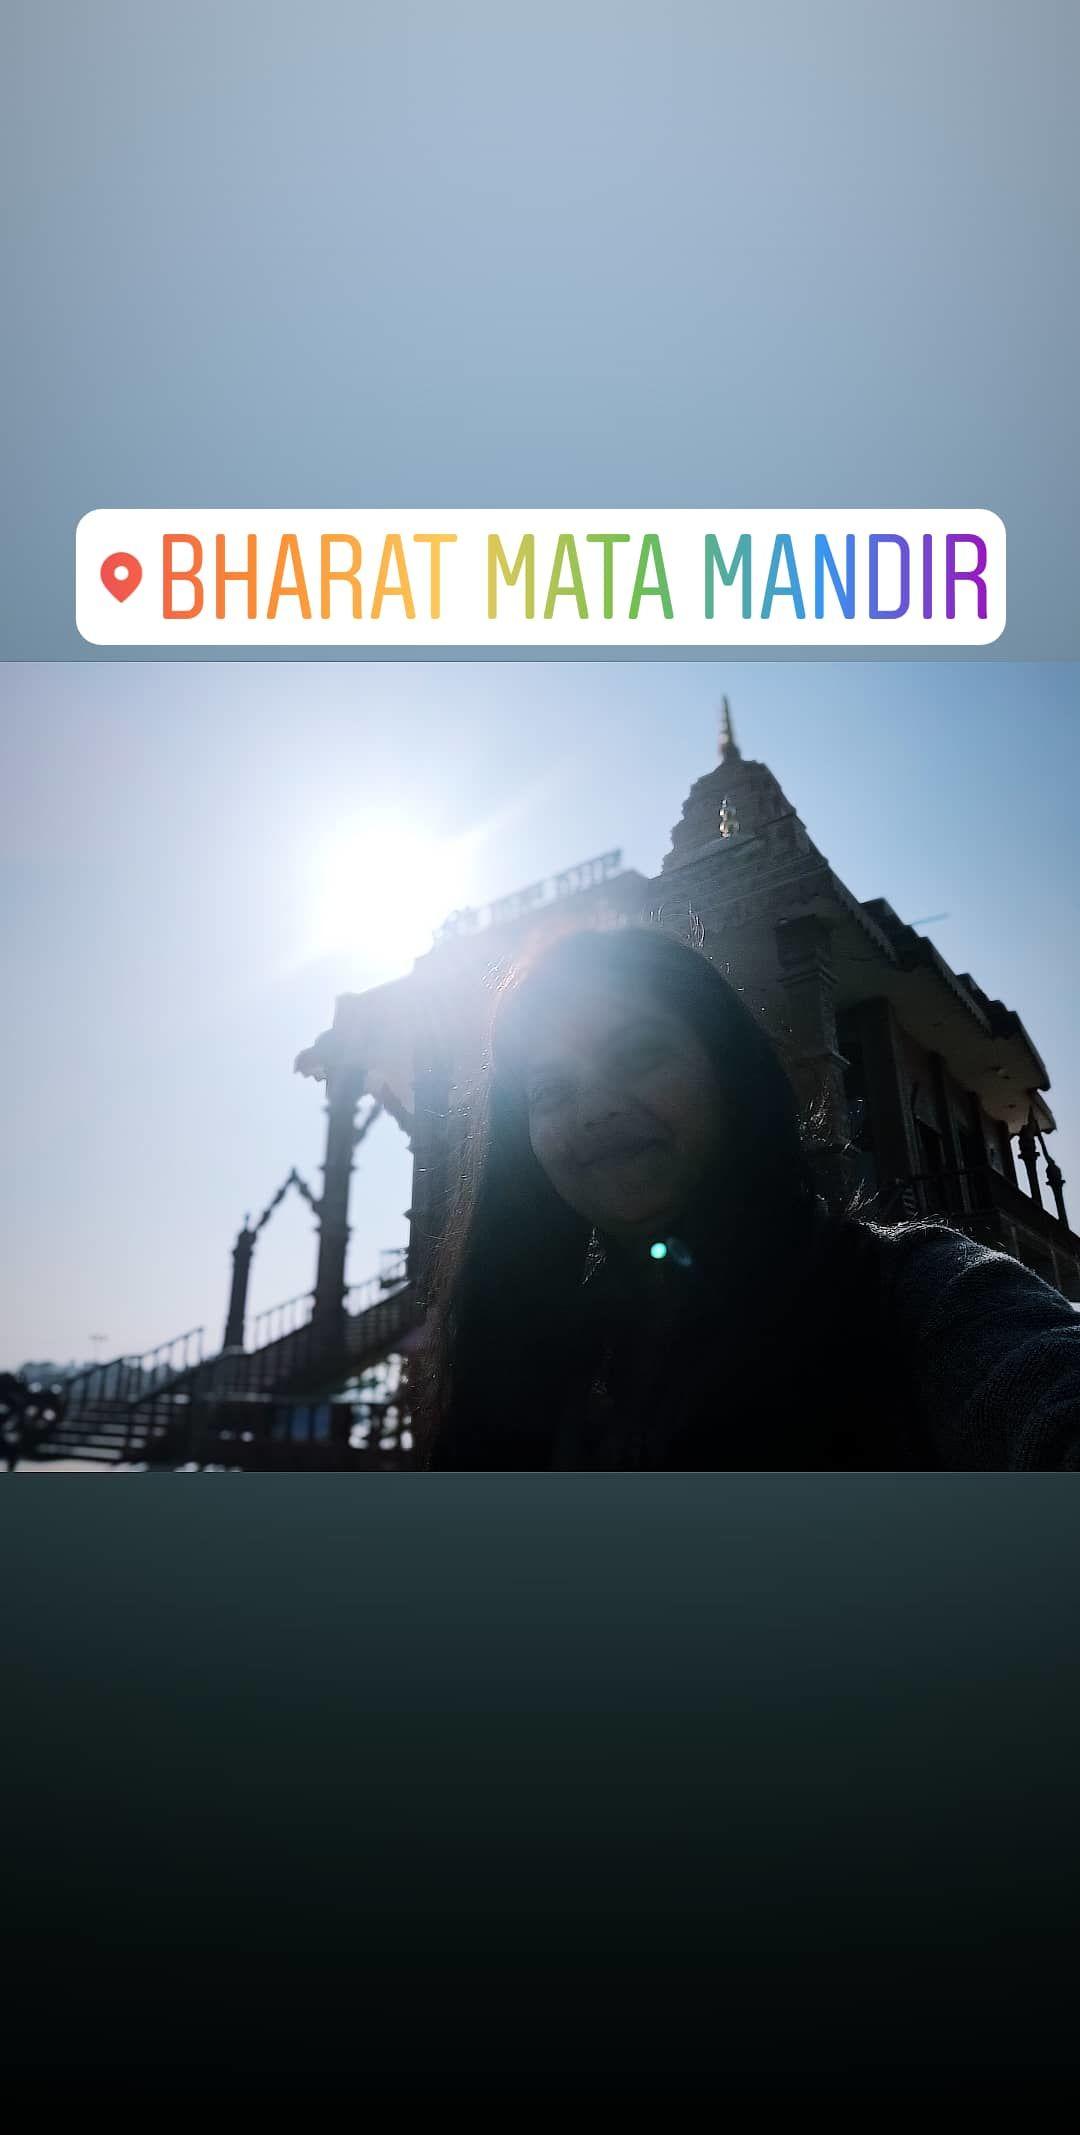 Photo of Bharat Mata Mandir By SHWETA PATEL